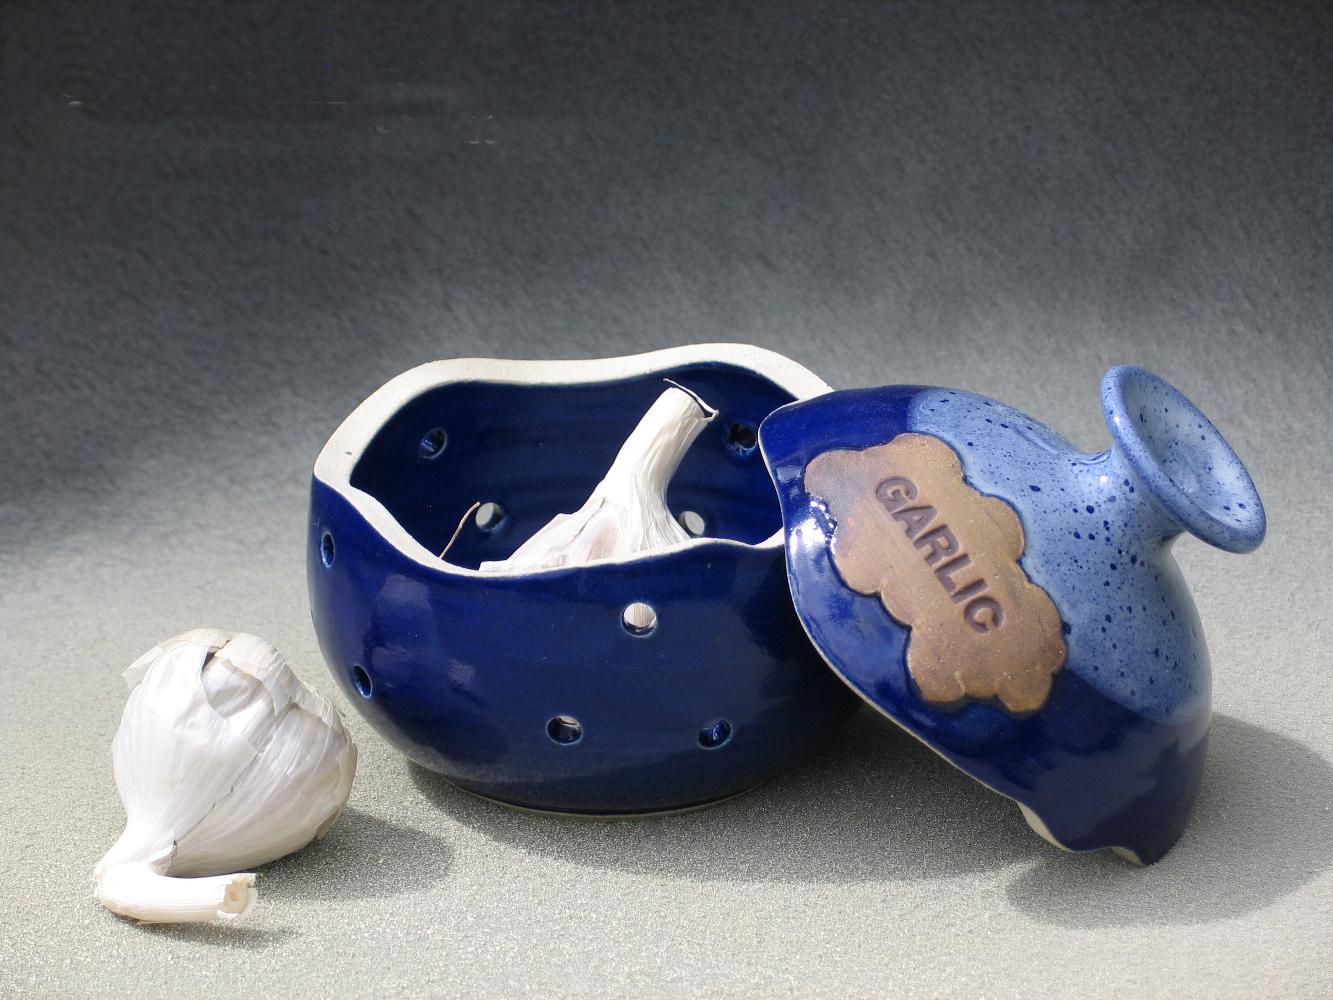 EVP garlic